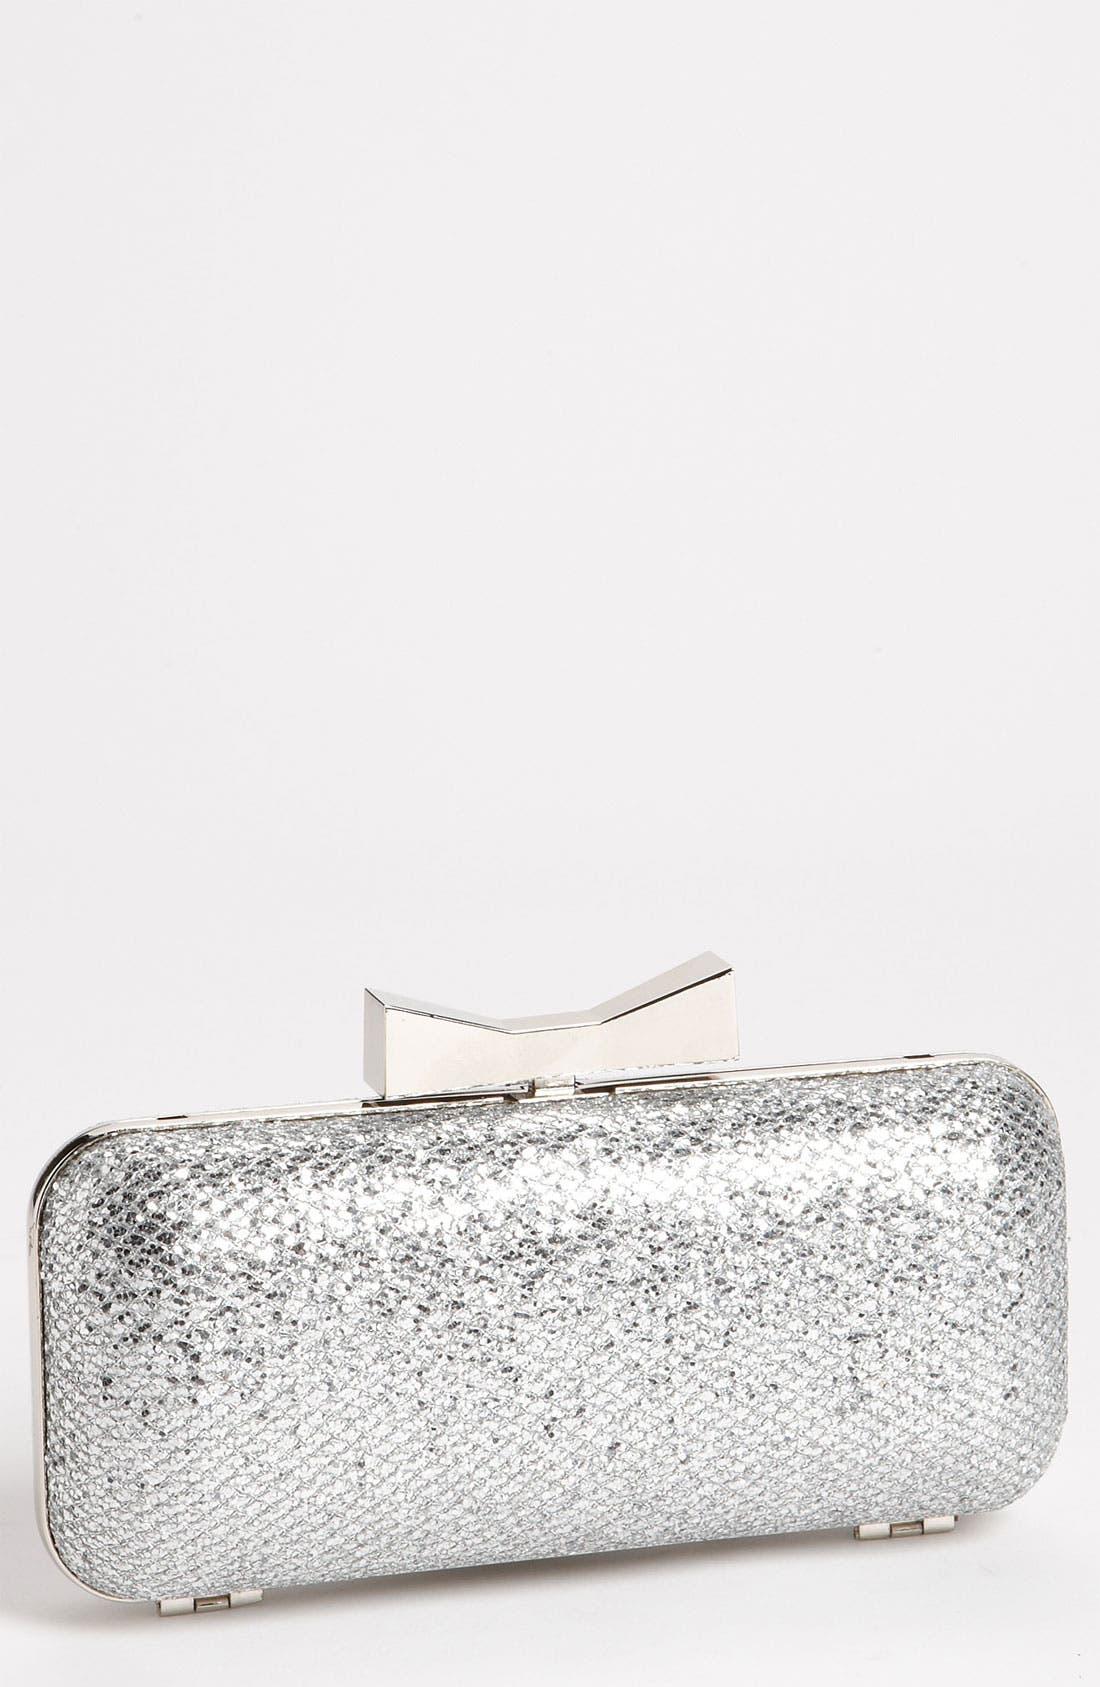 Alternate Image 1 Selected - Natasha Couture 'Glitter' Clutch